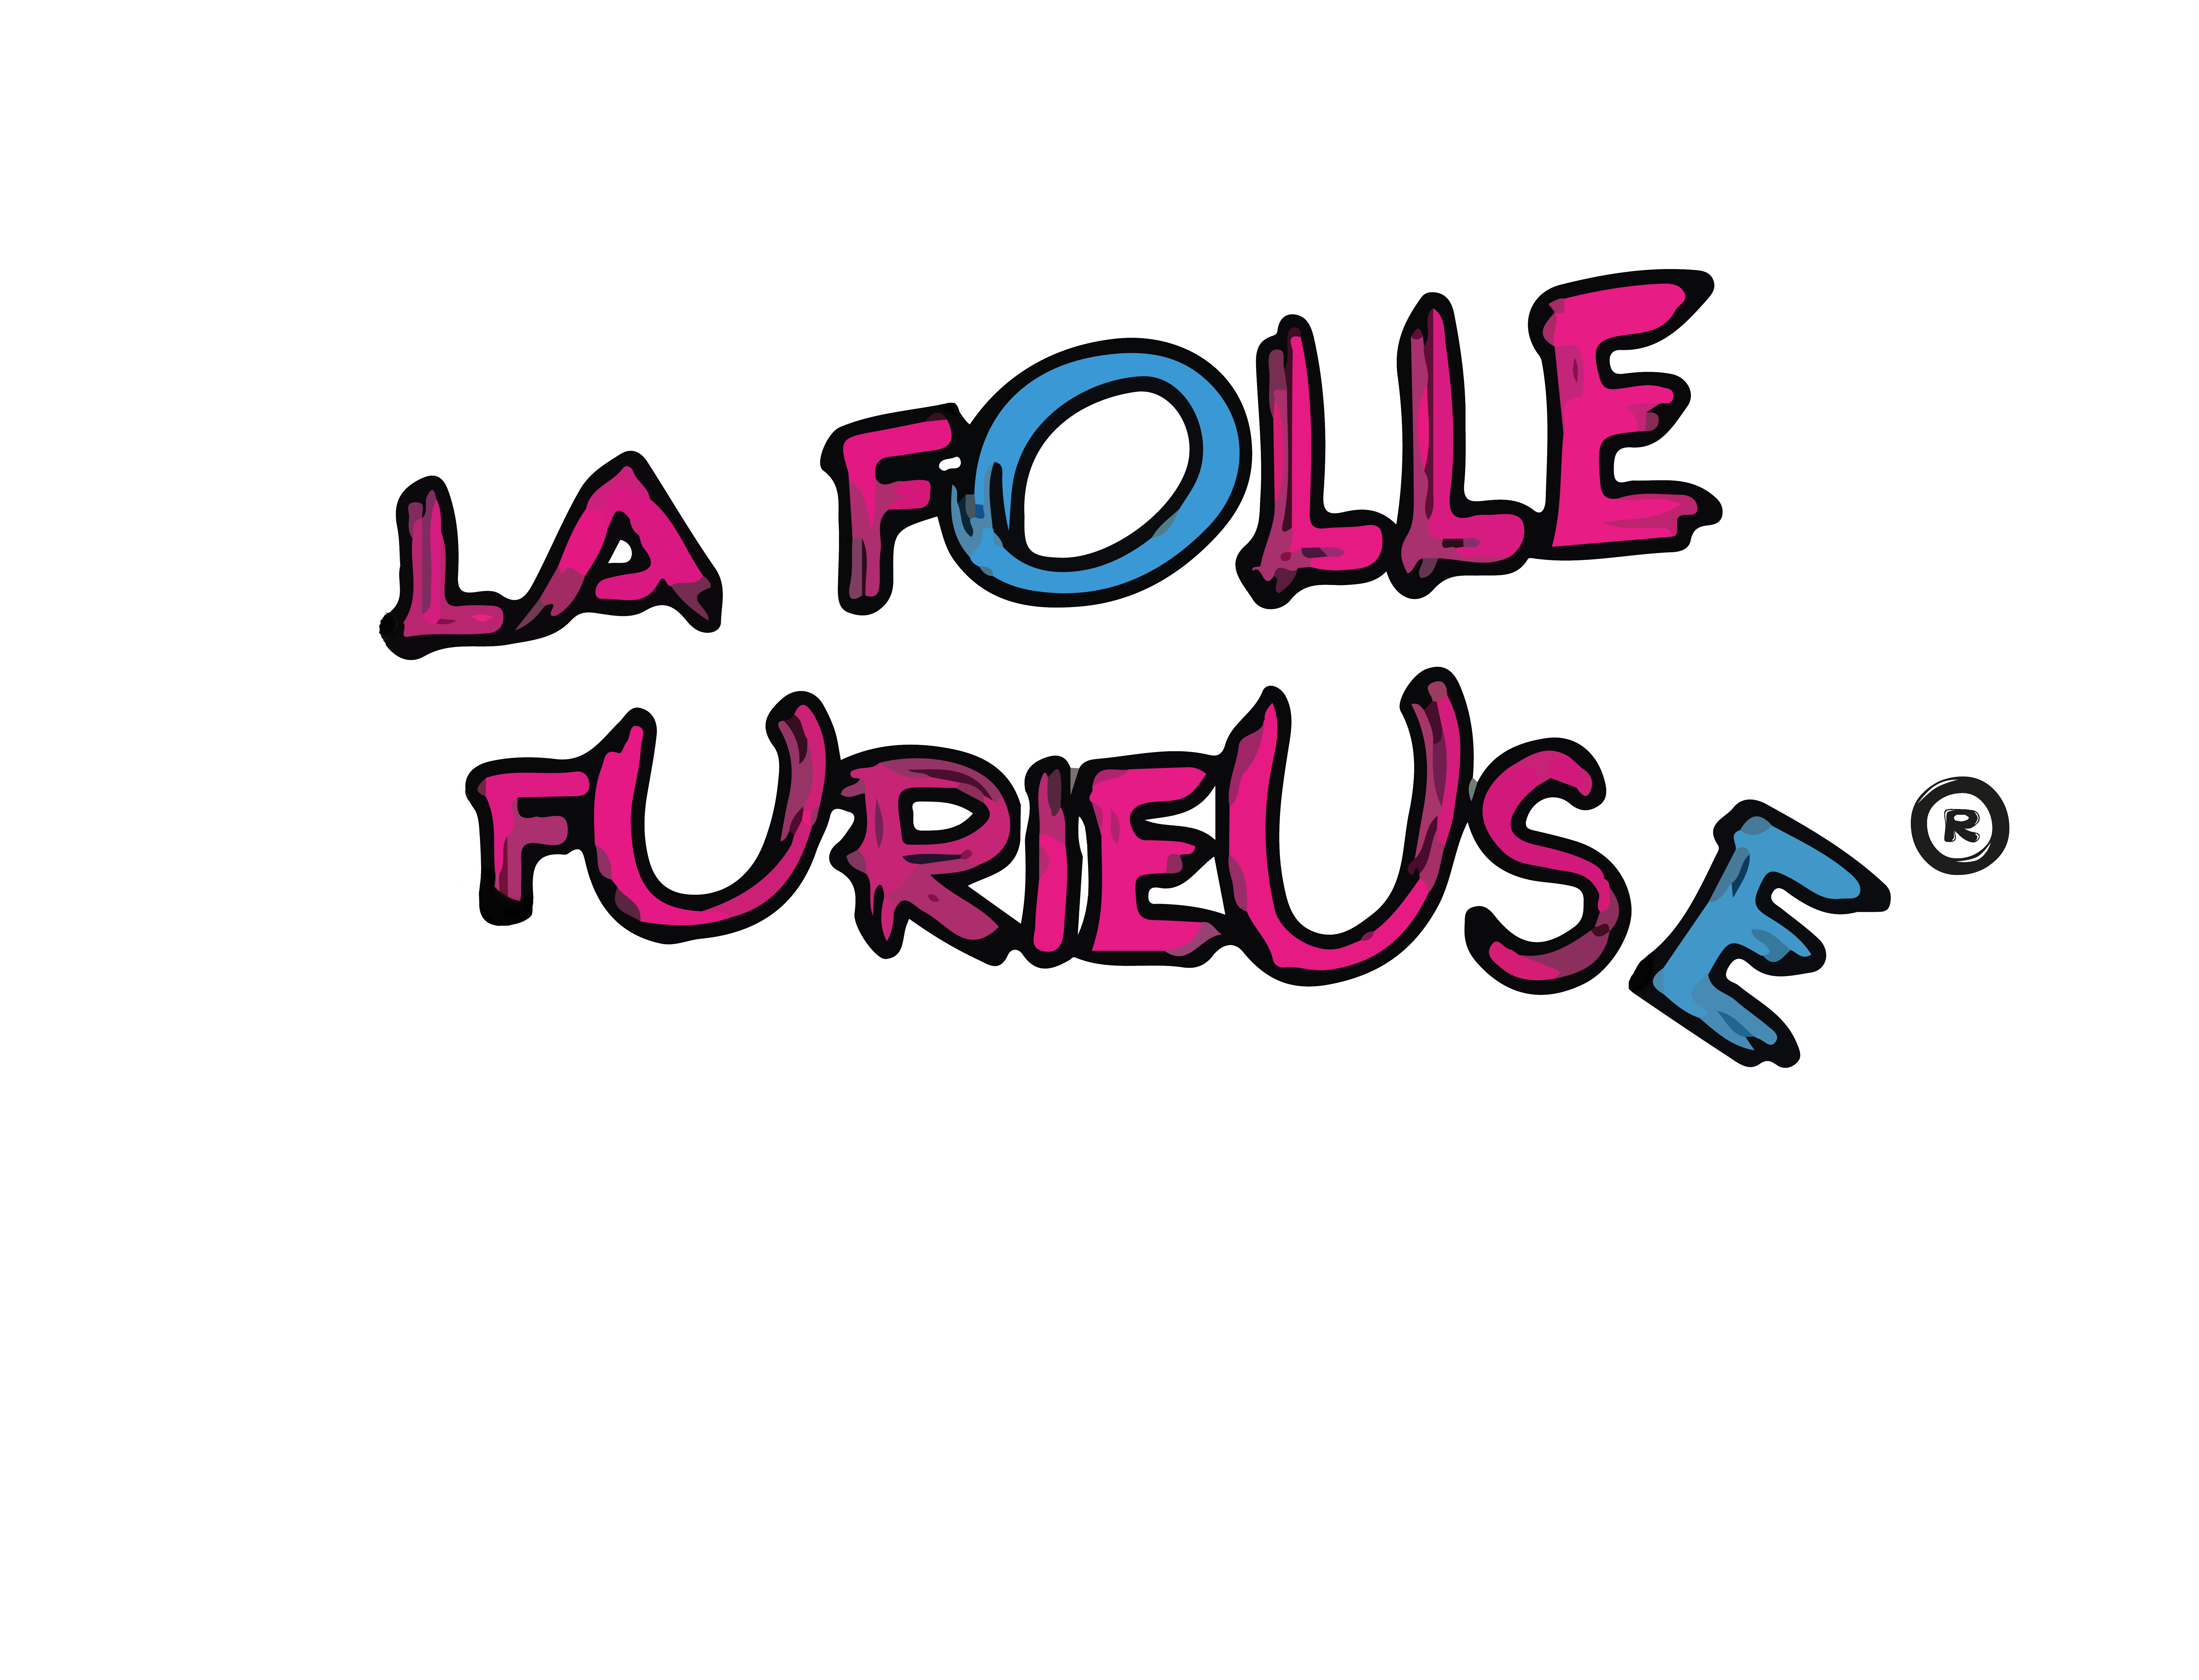 FOLLE FURIEUSE